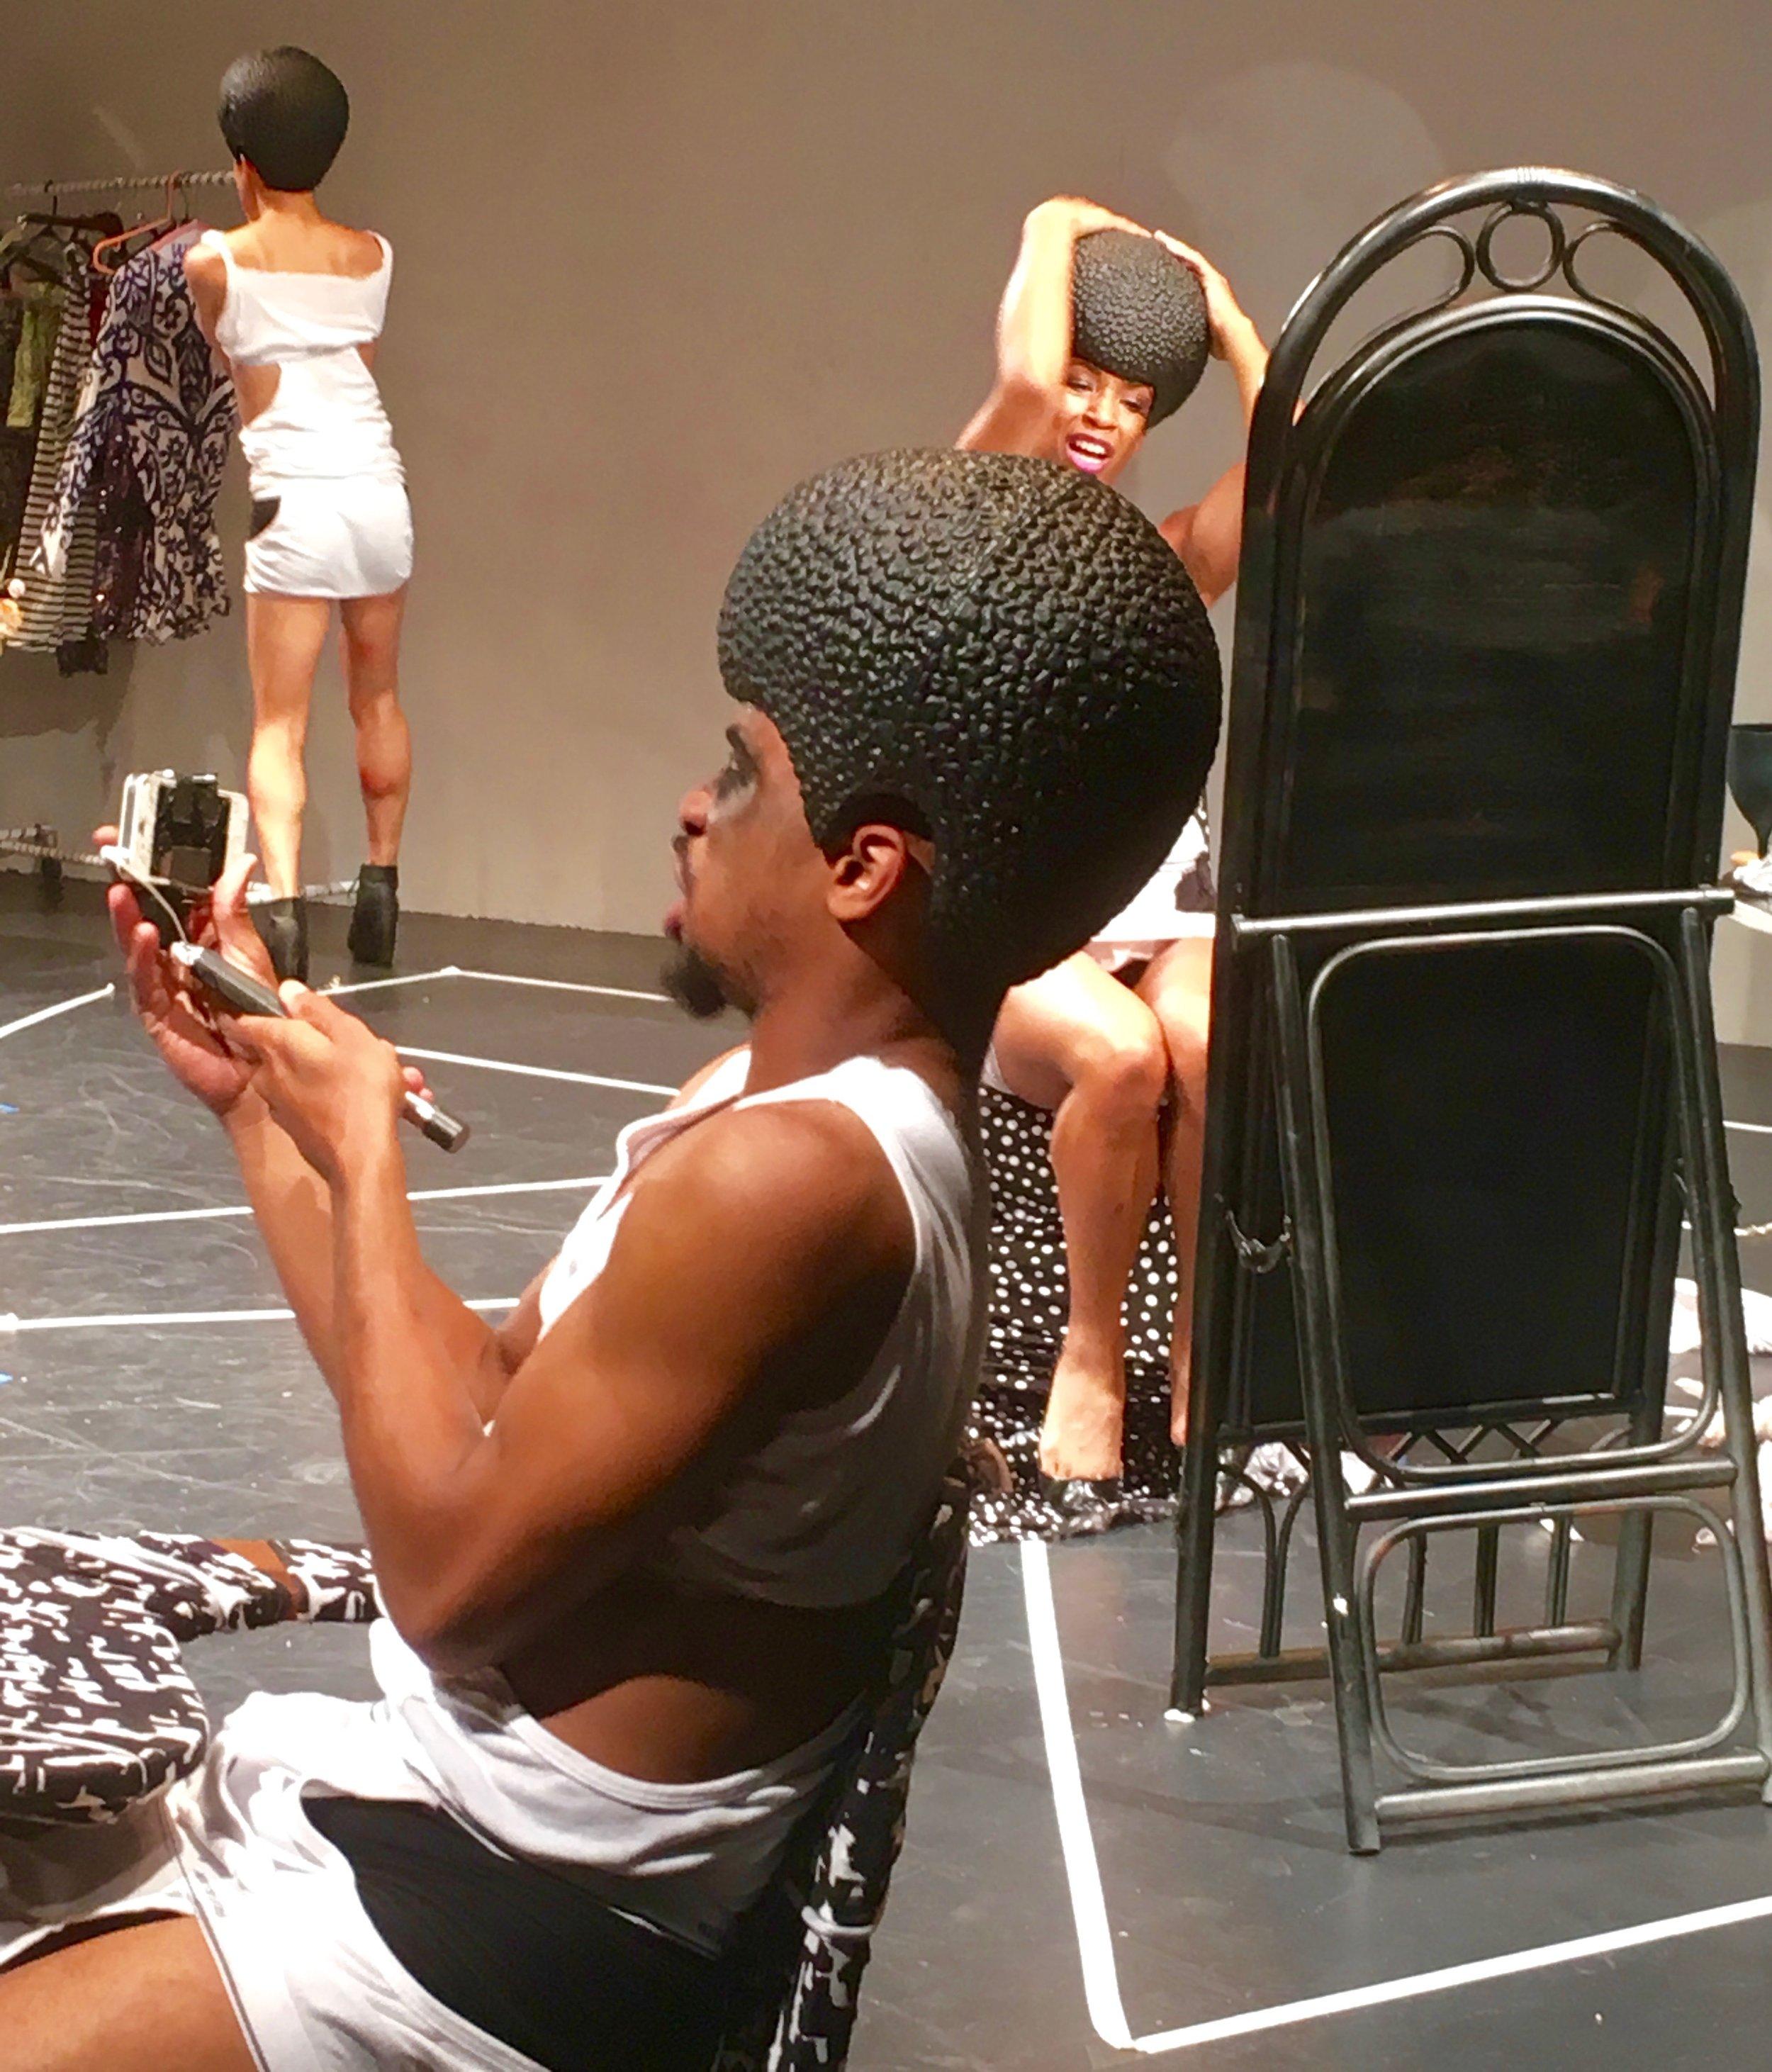 Going vogue: a performance at Dixon place. Photograph: Adrian Brune